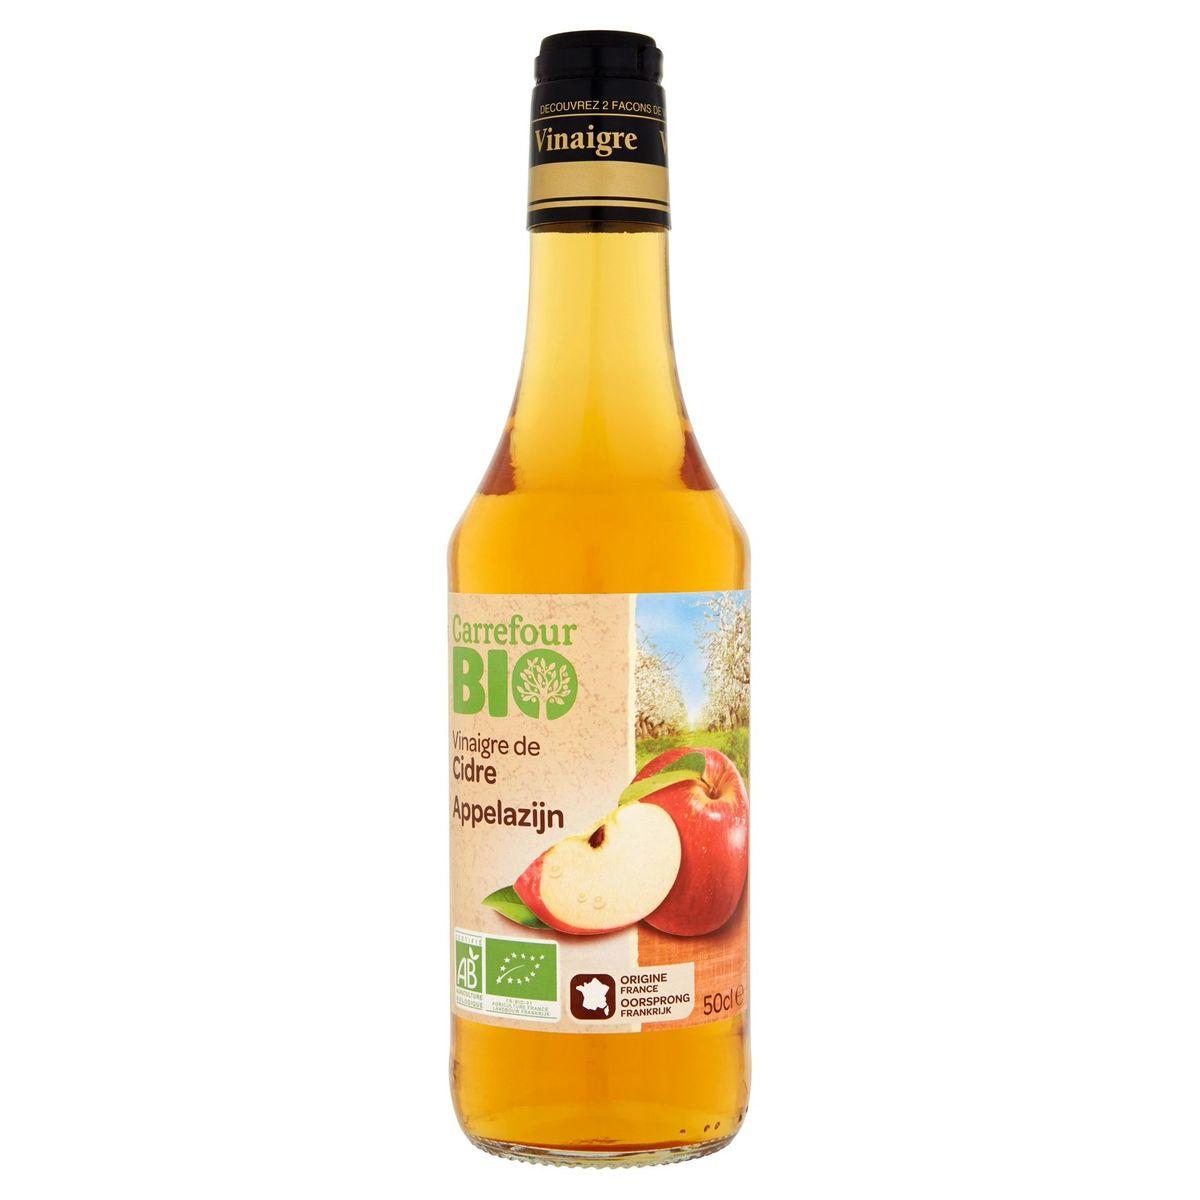 Carrefour Bio Appelazijn 50 cl